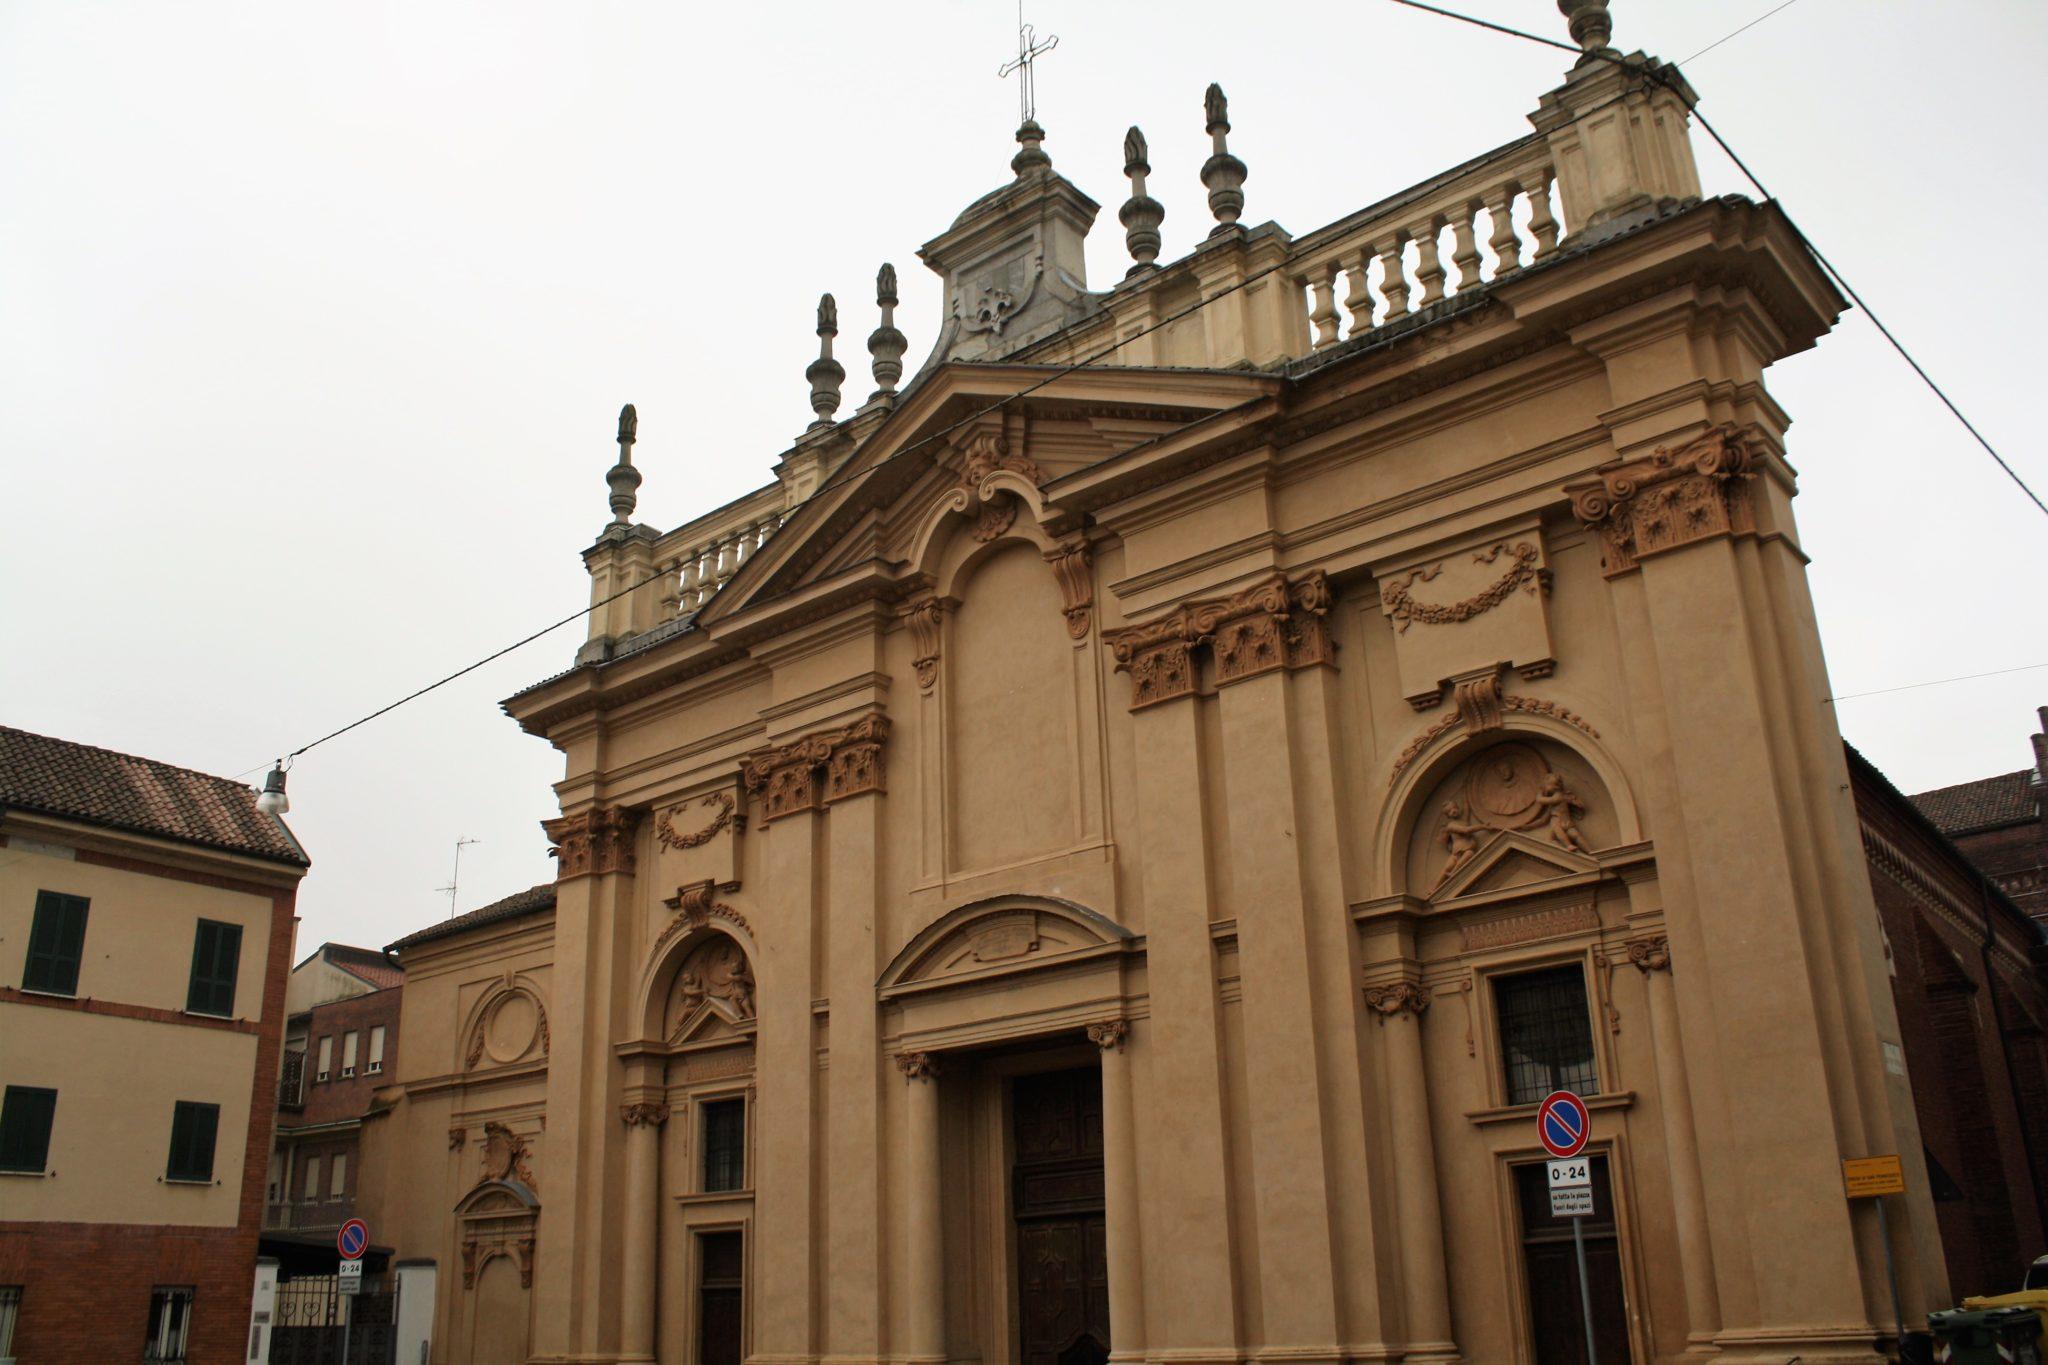 CHIESA DI SAN FRANCESCO ora PARROCCHIA DI SANT'AGNESE